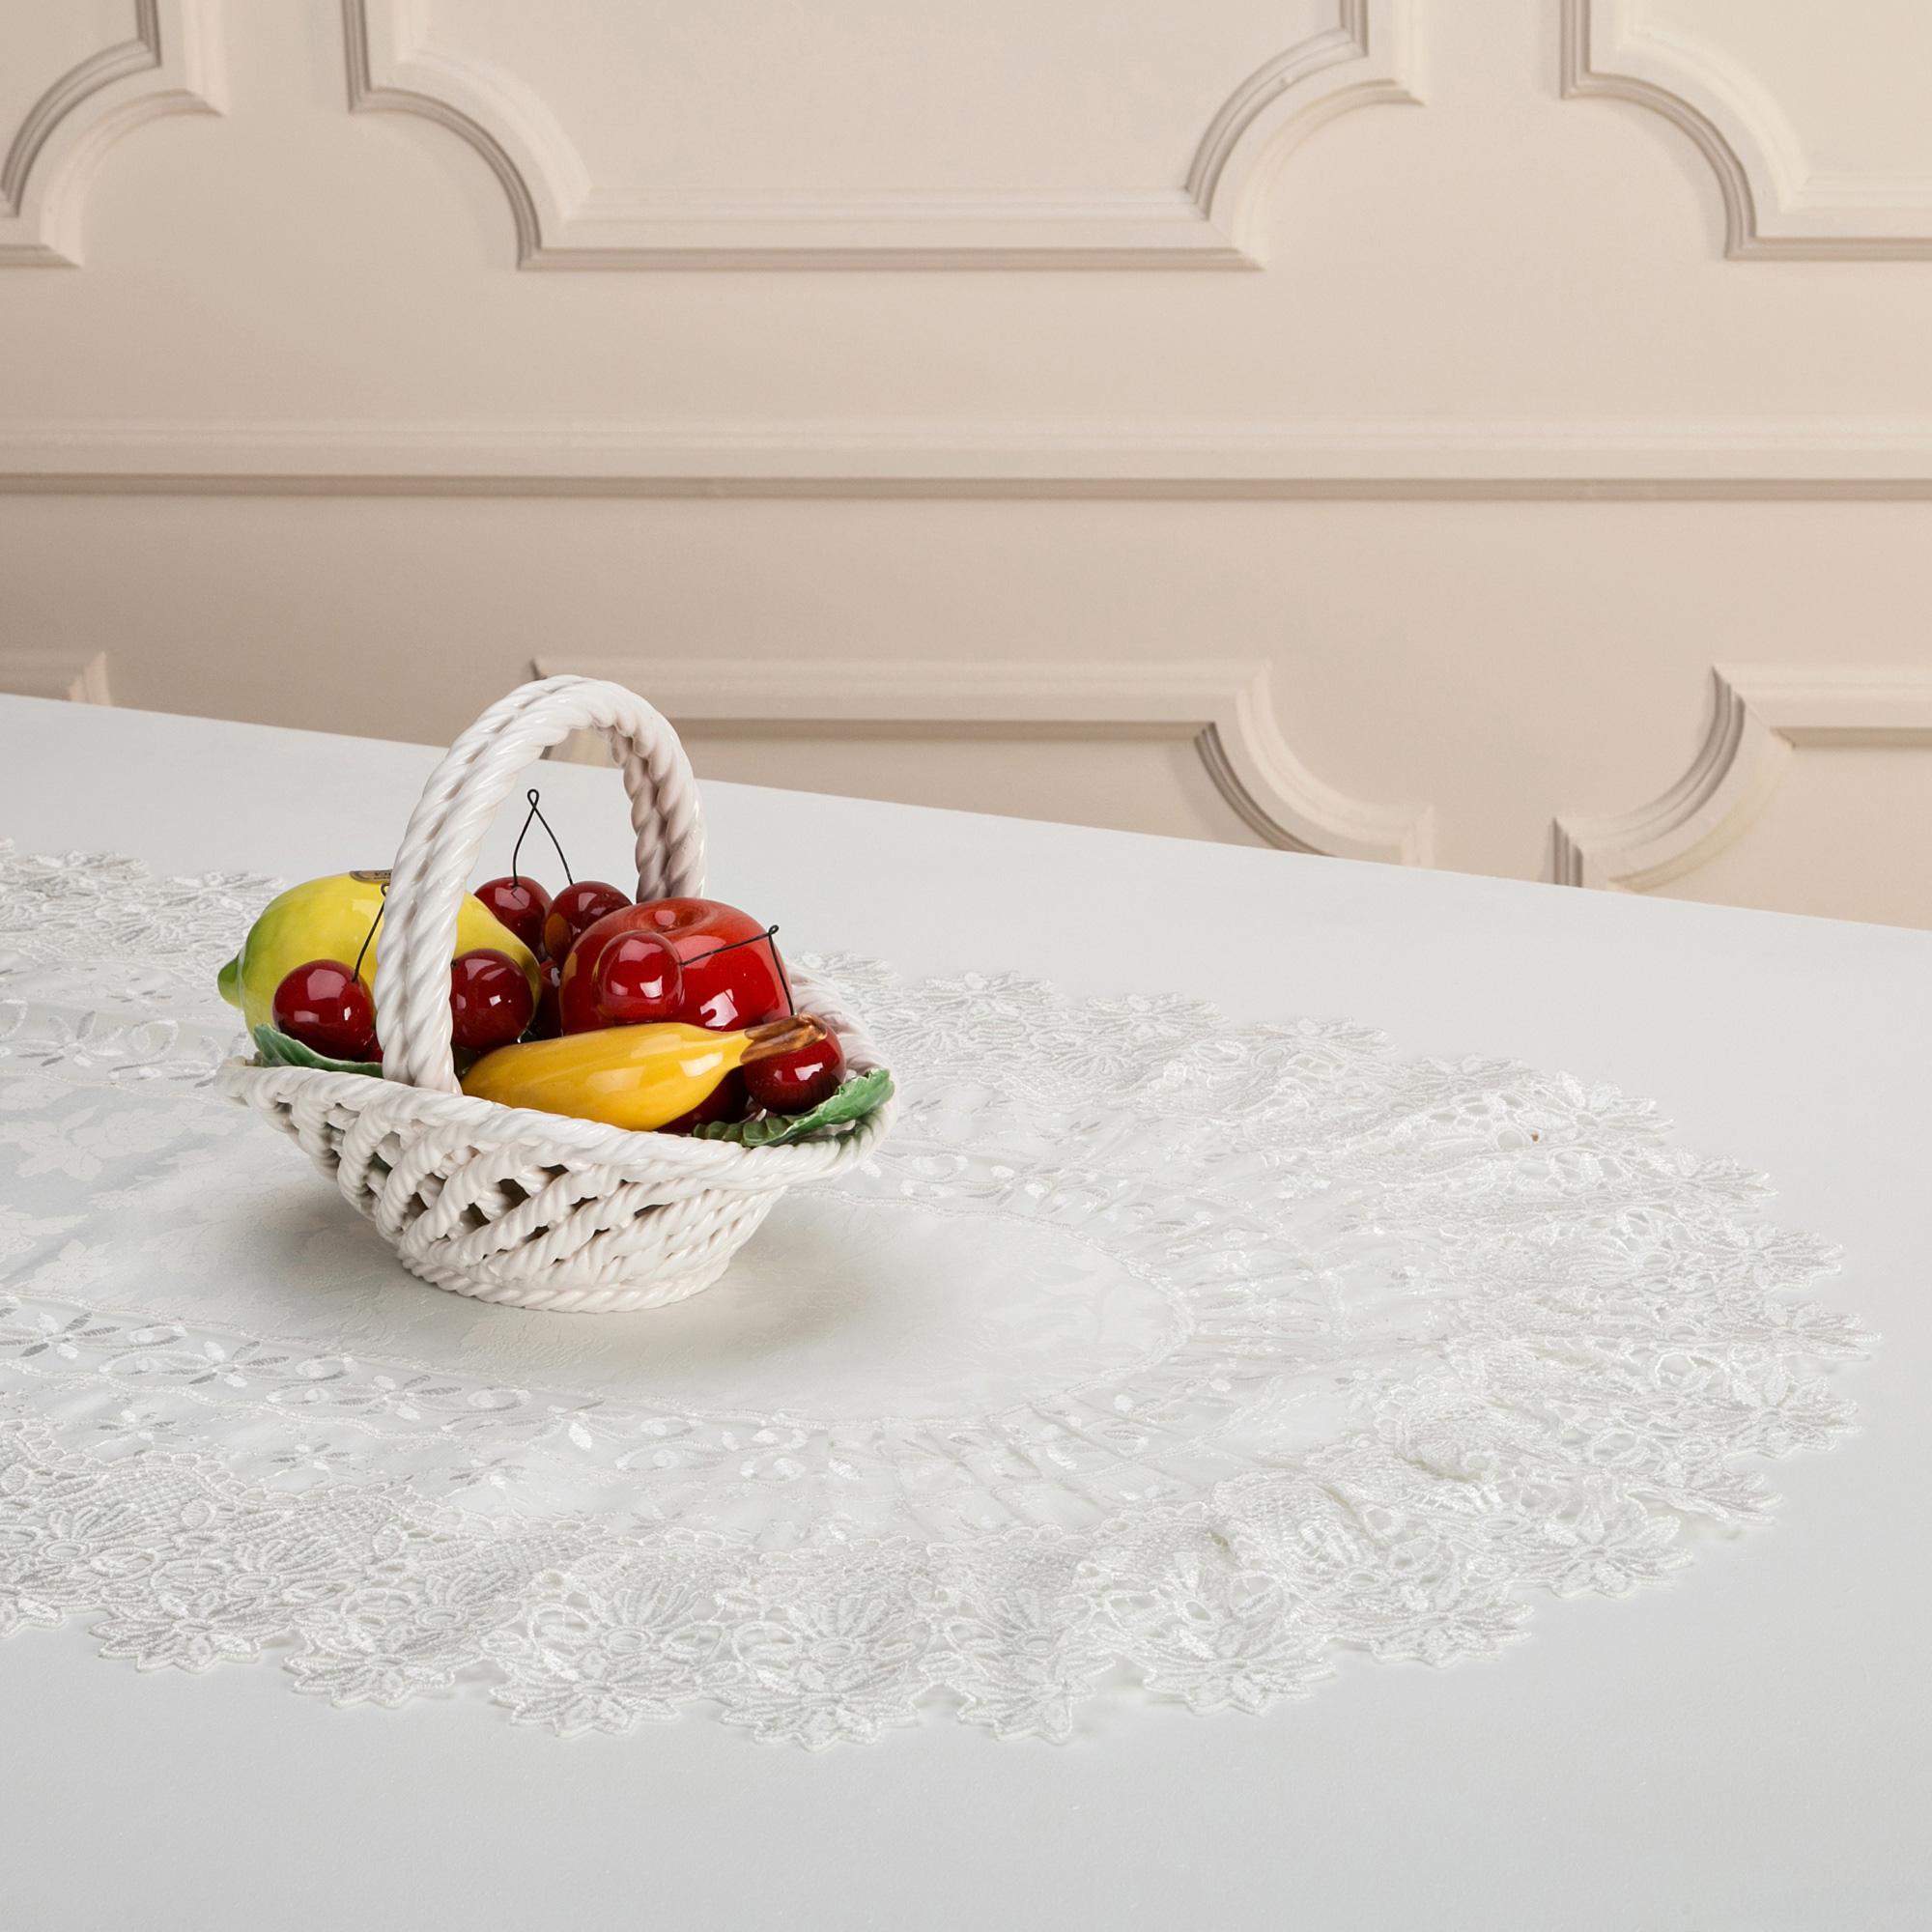 {} Arti-M Дорожка на стол Brayden Цвет: Белый (50х100 см) arti m дорожка на стол brayden цвет бежевый 50х100 см